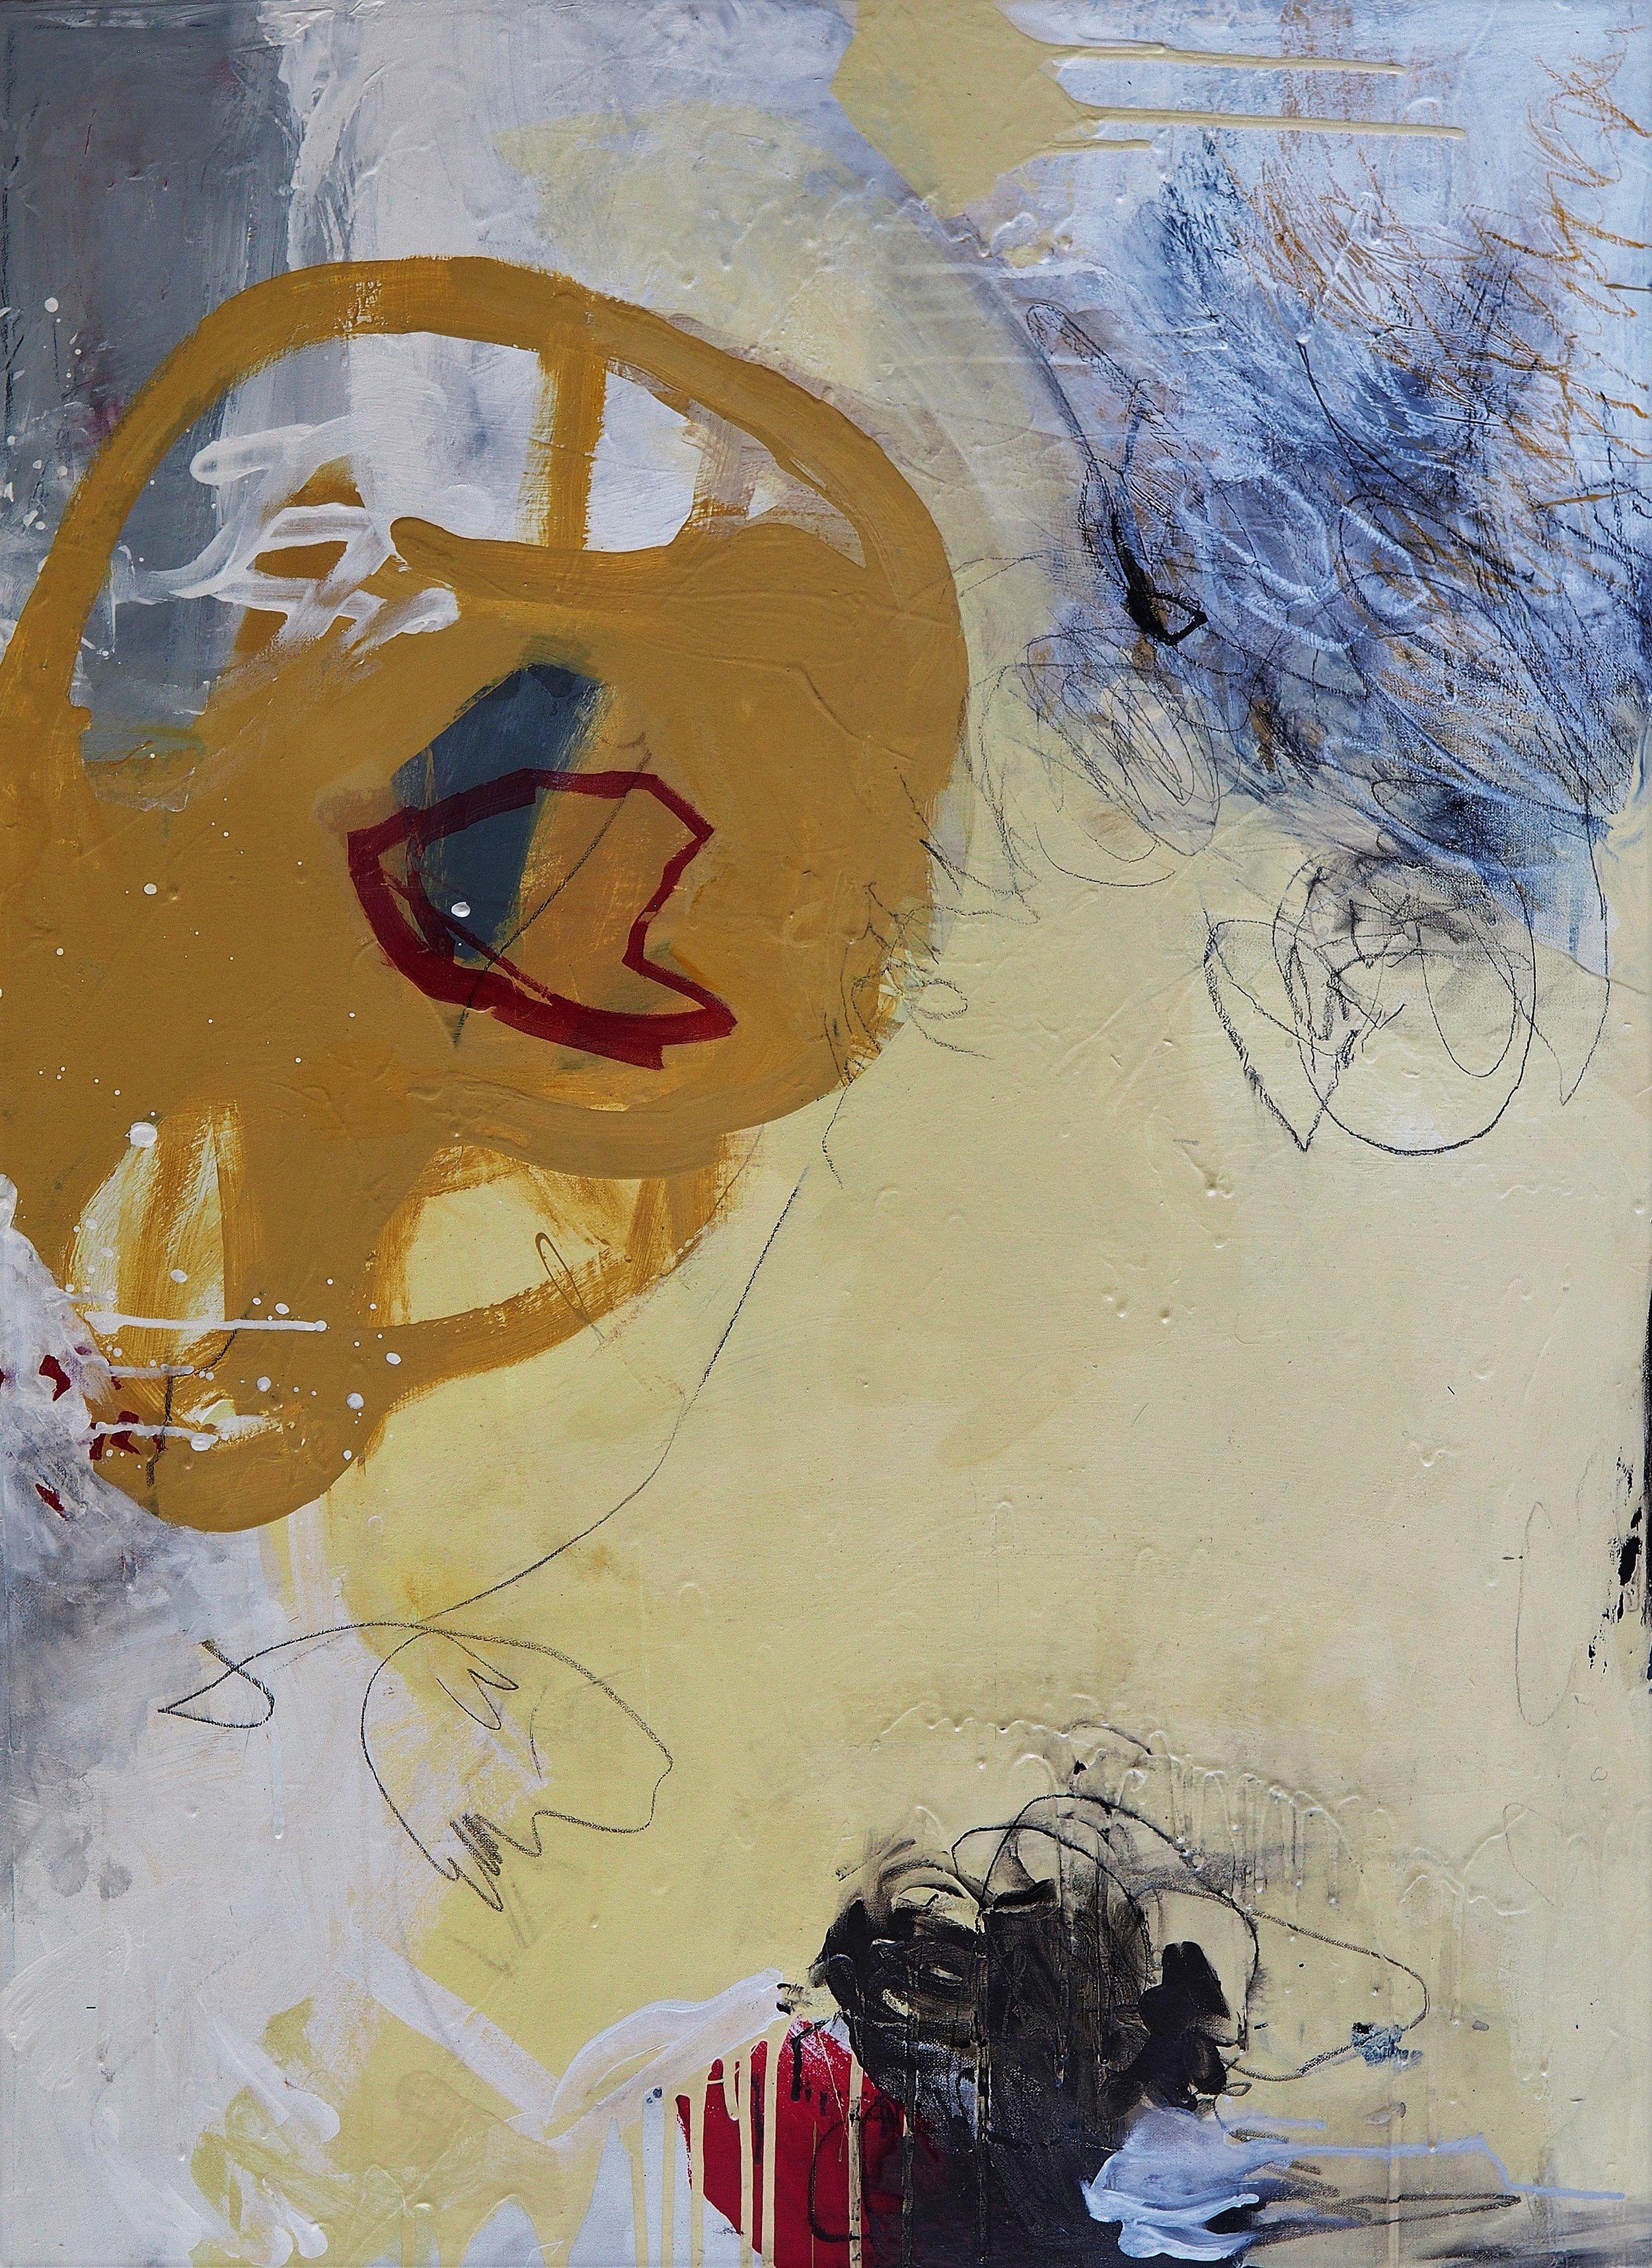 "Acrylic on canvas 16SWP112 24"" x 36"" x 1.5"""